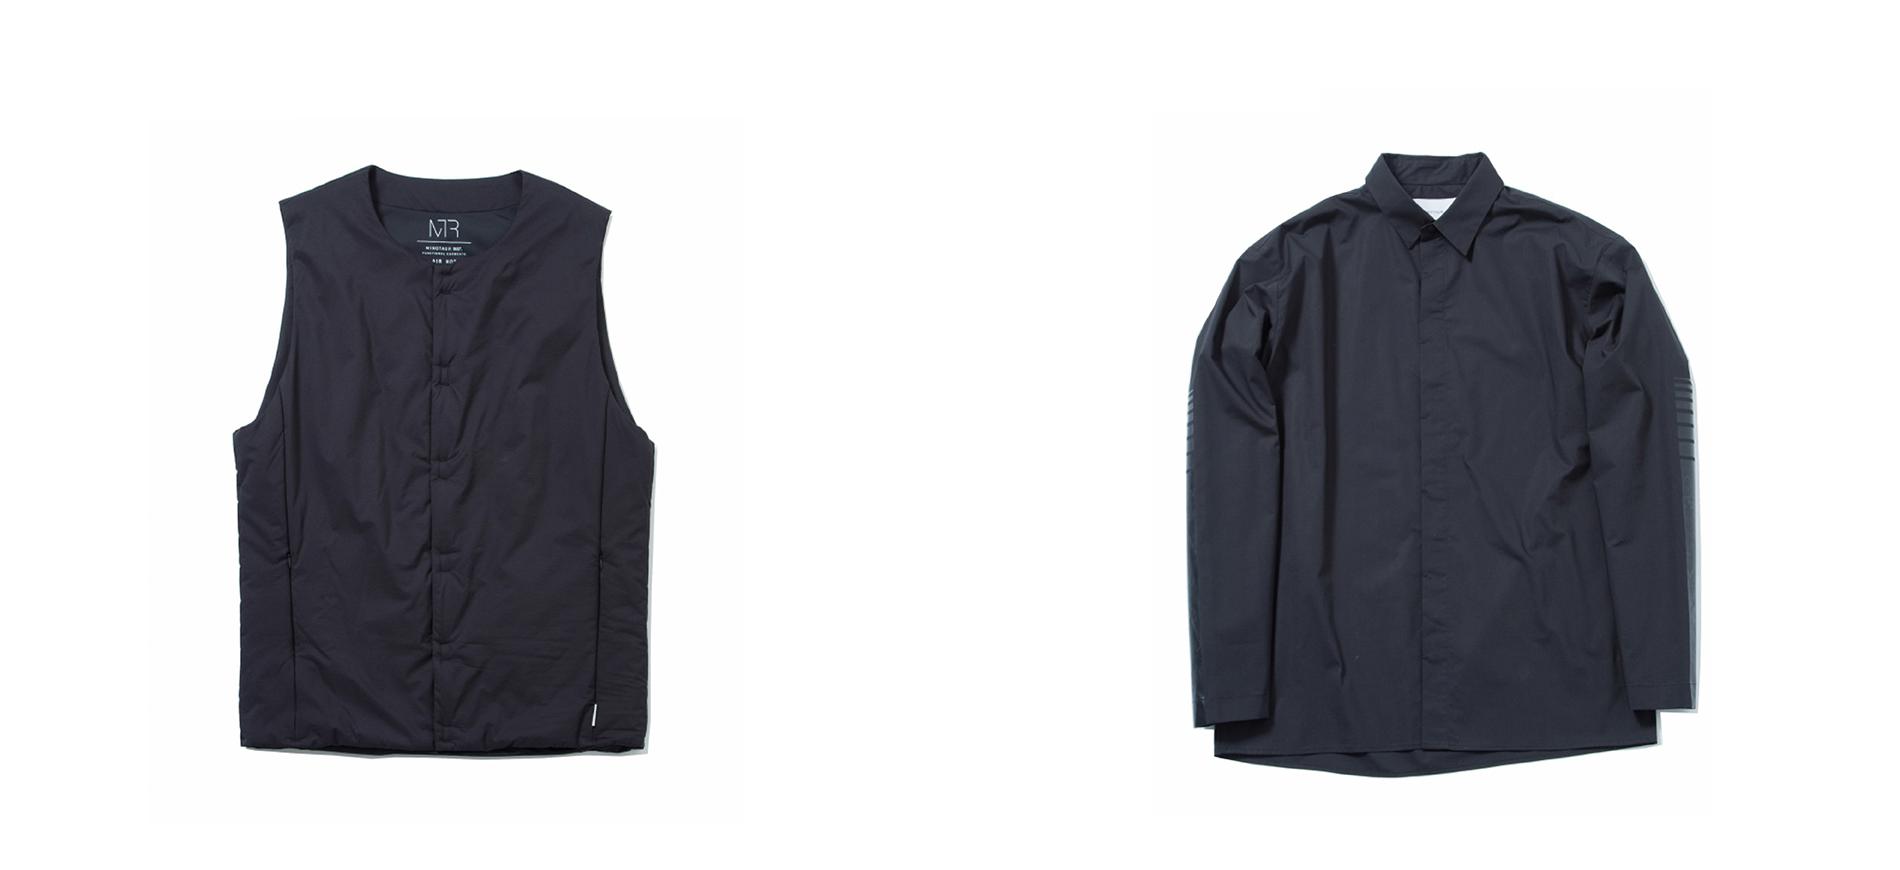 pop-trading-company-minotaur-vest-shirt